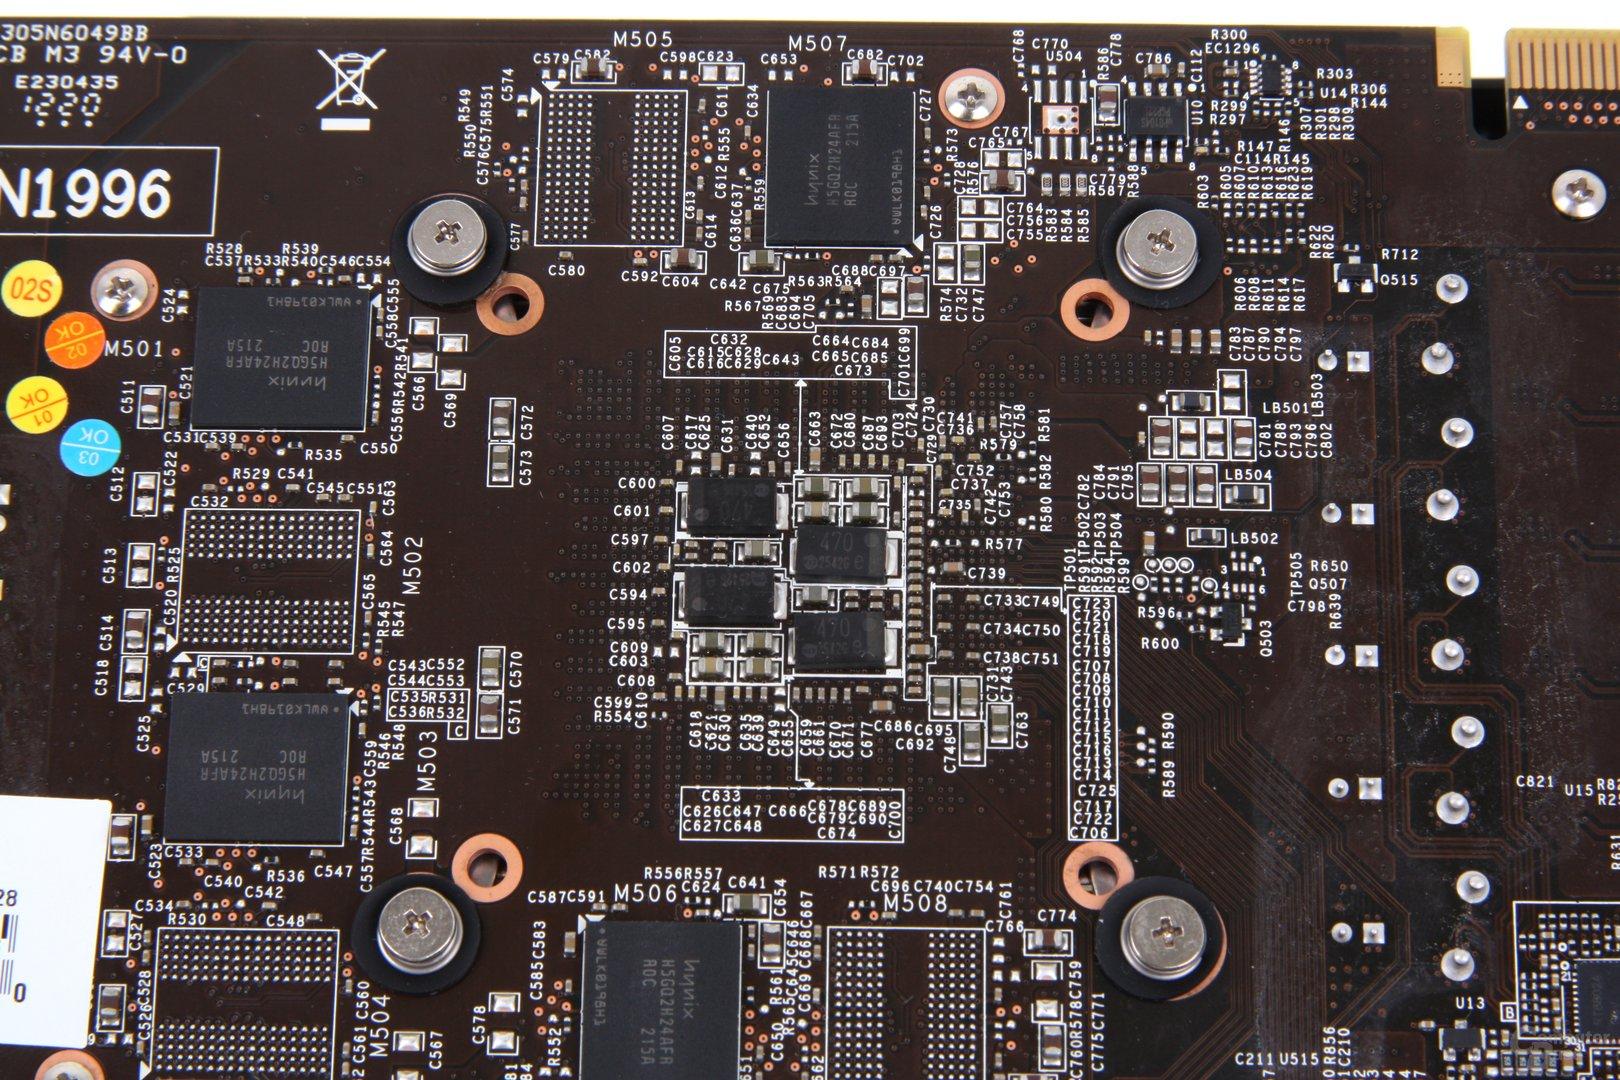 GeForce GTX 670 PE OC GPU-Rückseite